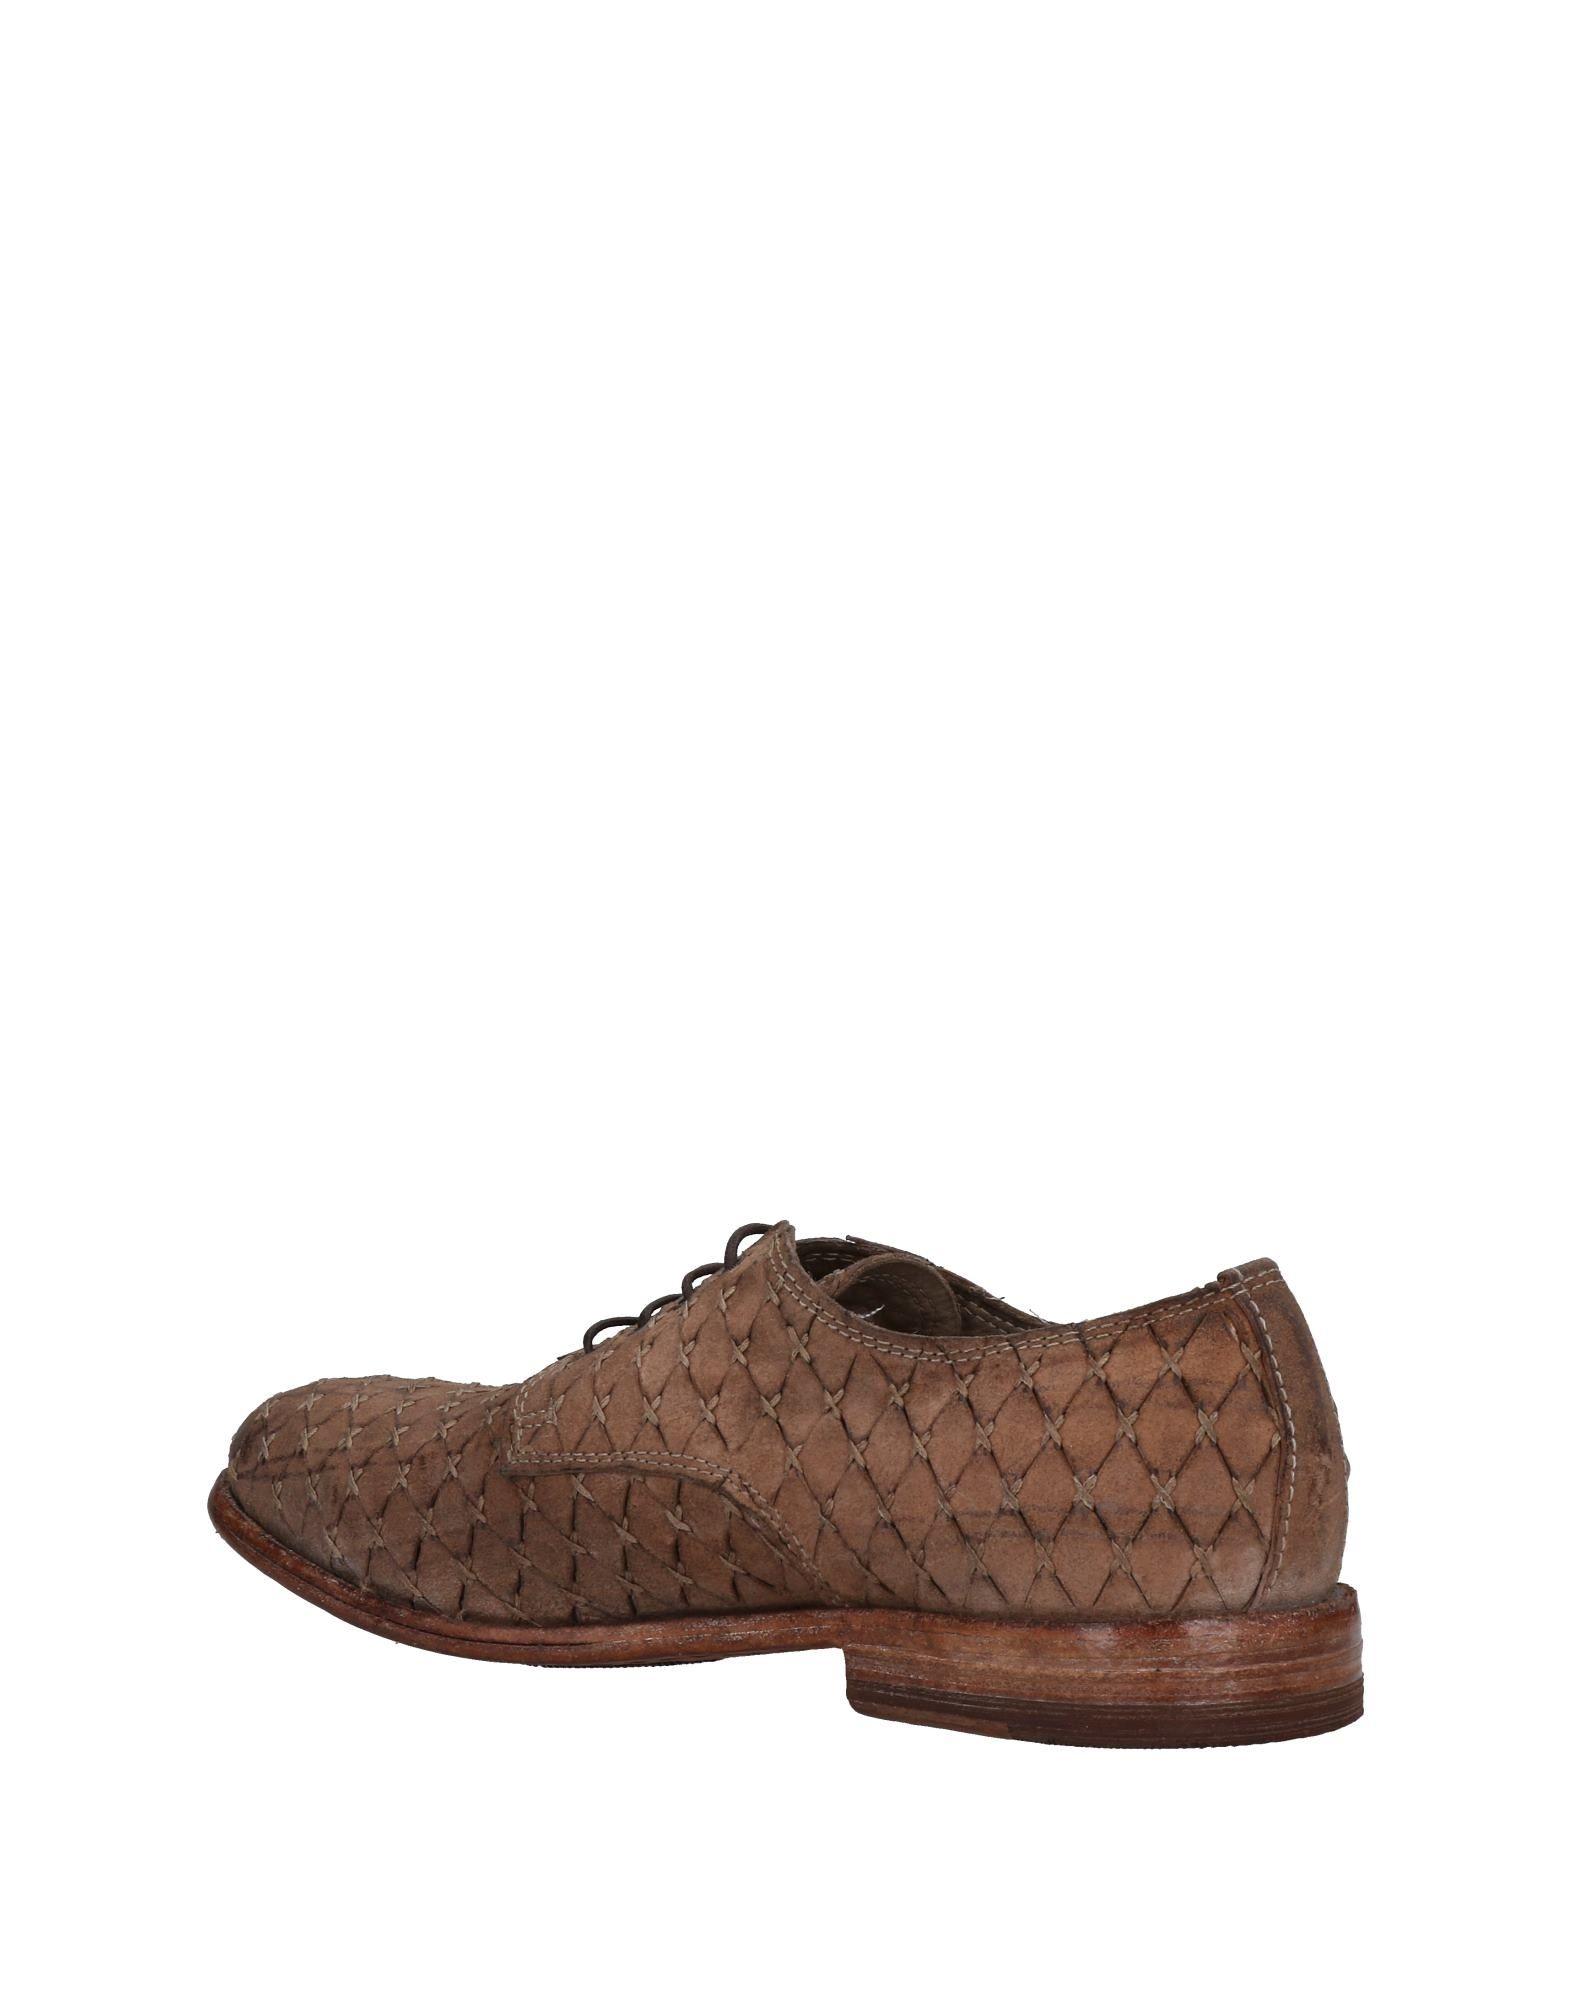 Moma Schnürschuhe Herren  11492215KN Gute Qualität beliebte Schuhe